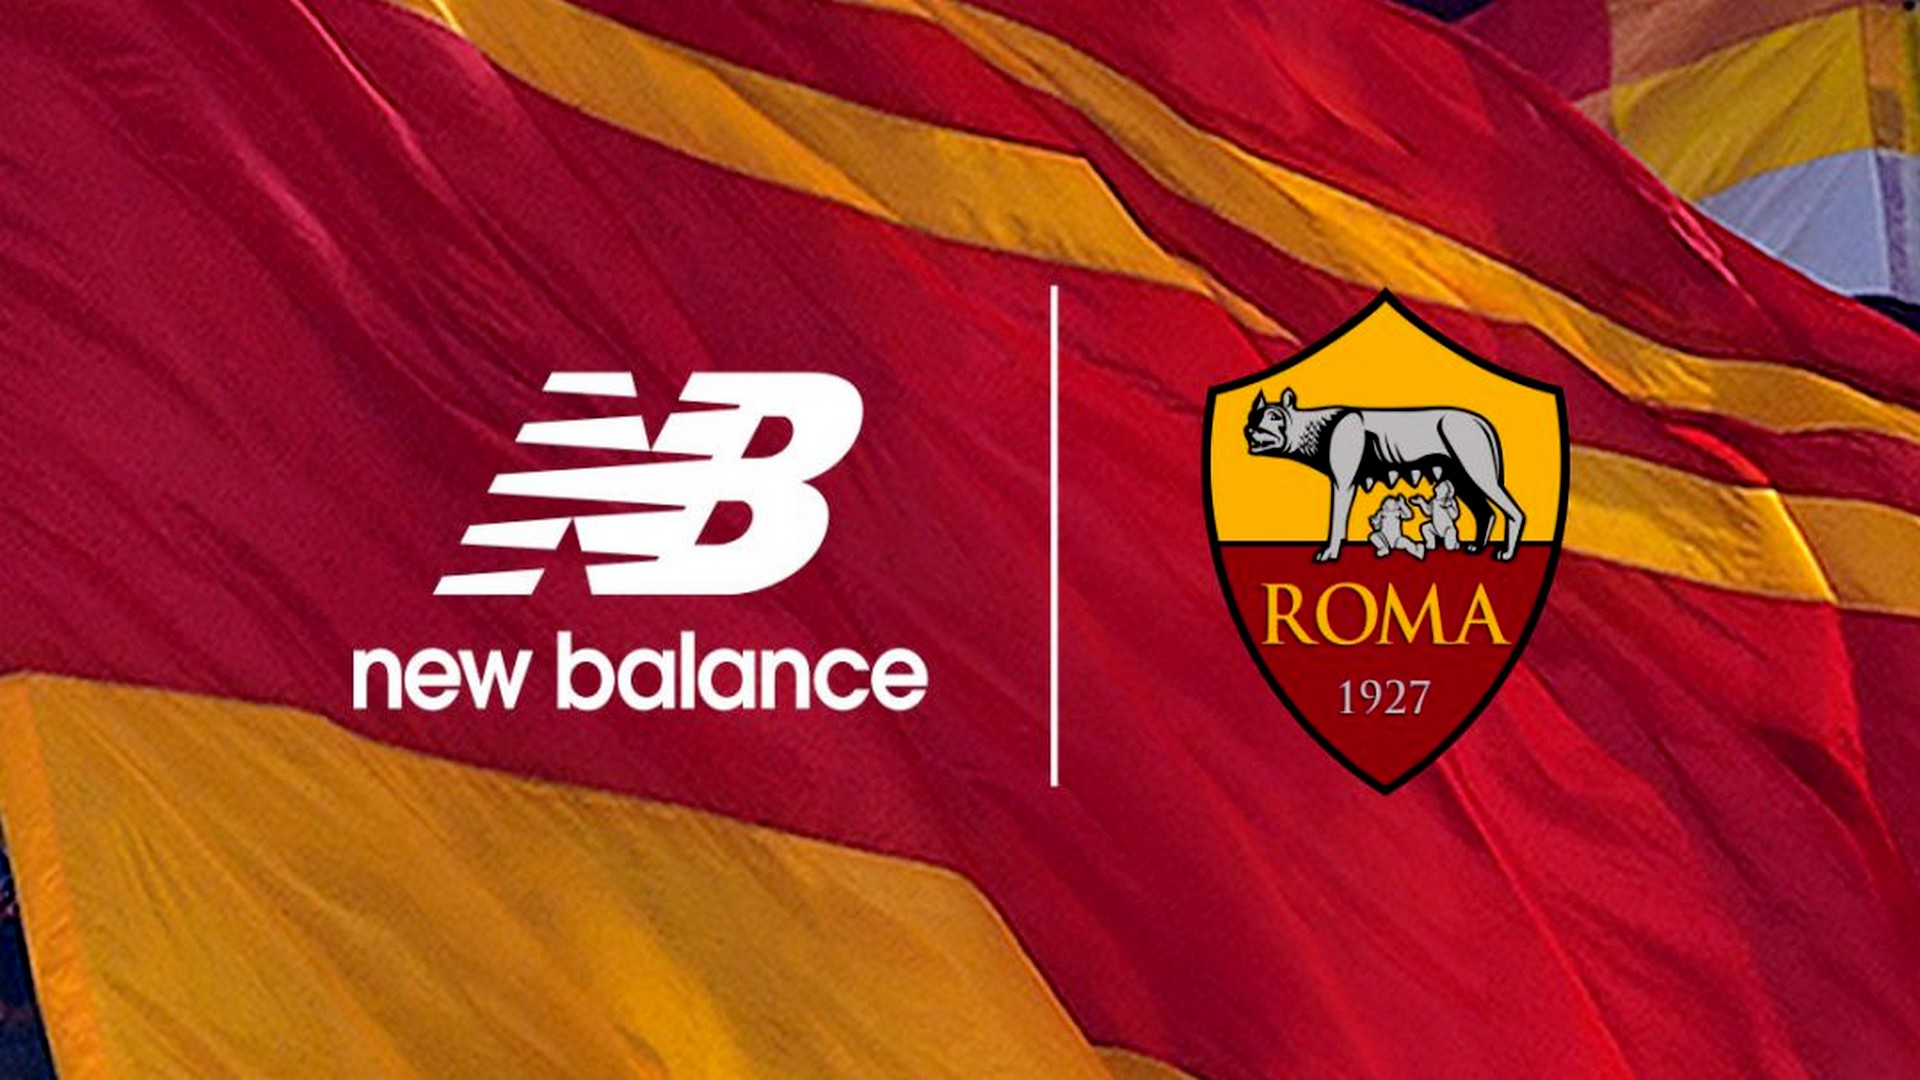 New Balance x AS Roma (football) 2021